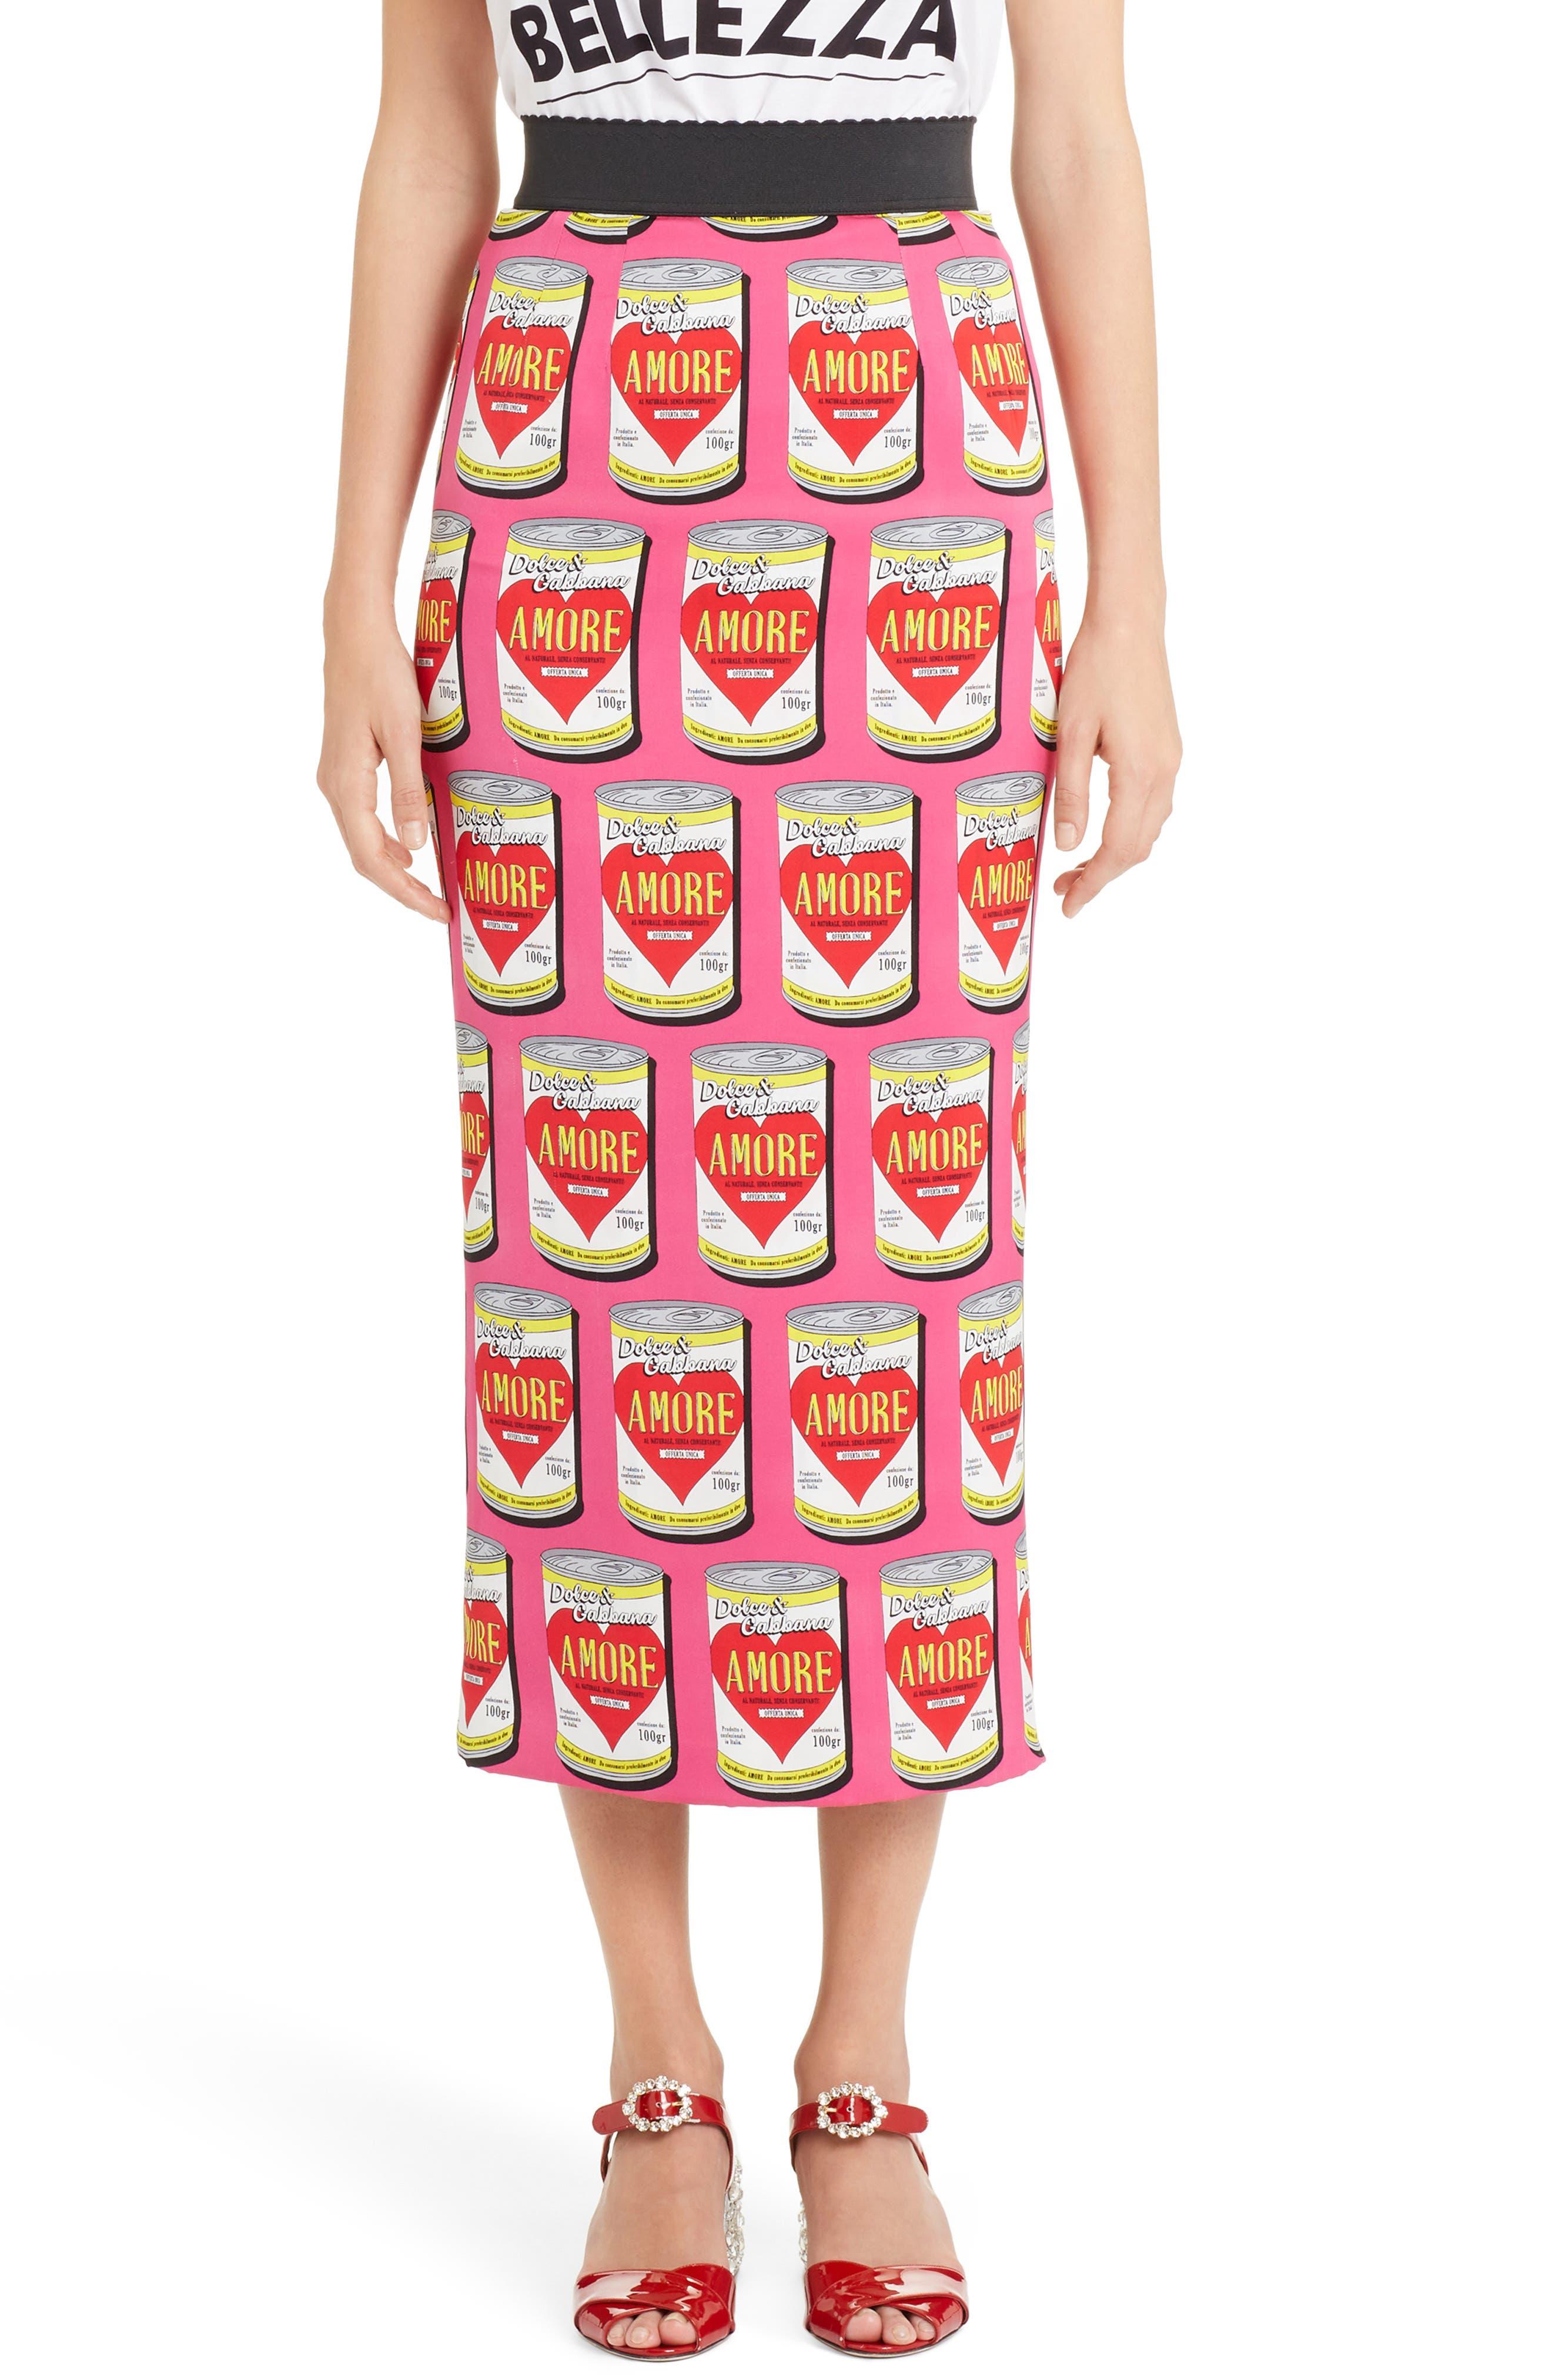 Dolce&Gabbana Can Print Silk Blend Charmeuse Pencil Skirt